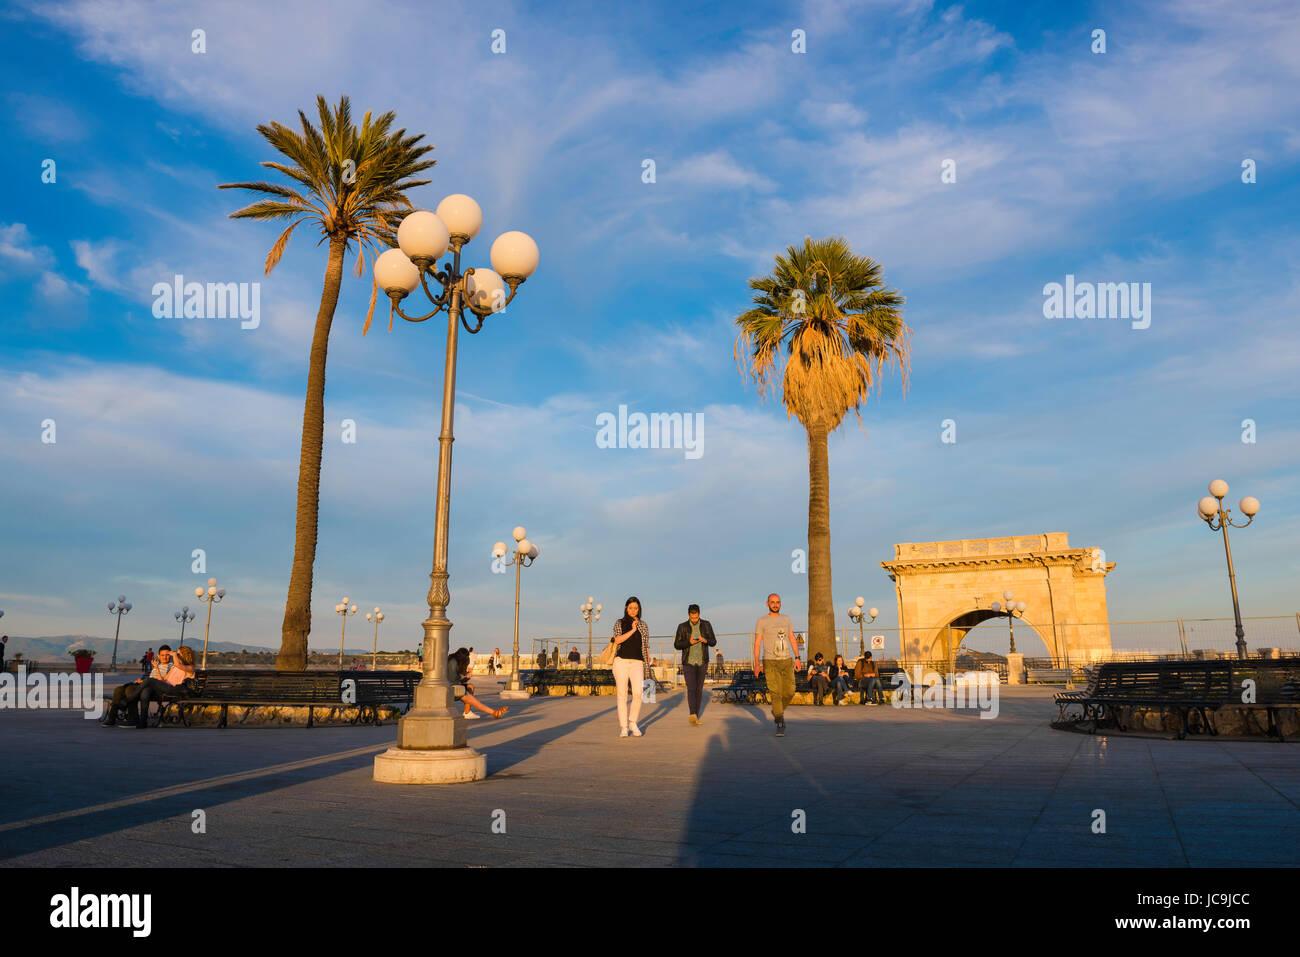 Cagliari Sardaigne Castello, au coucher du soleil les gens se promener dans la Terrazza Umberto l près de la Photo Stock